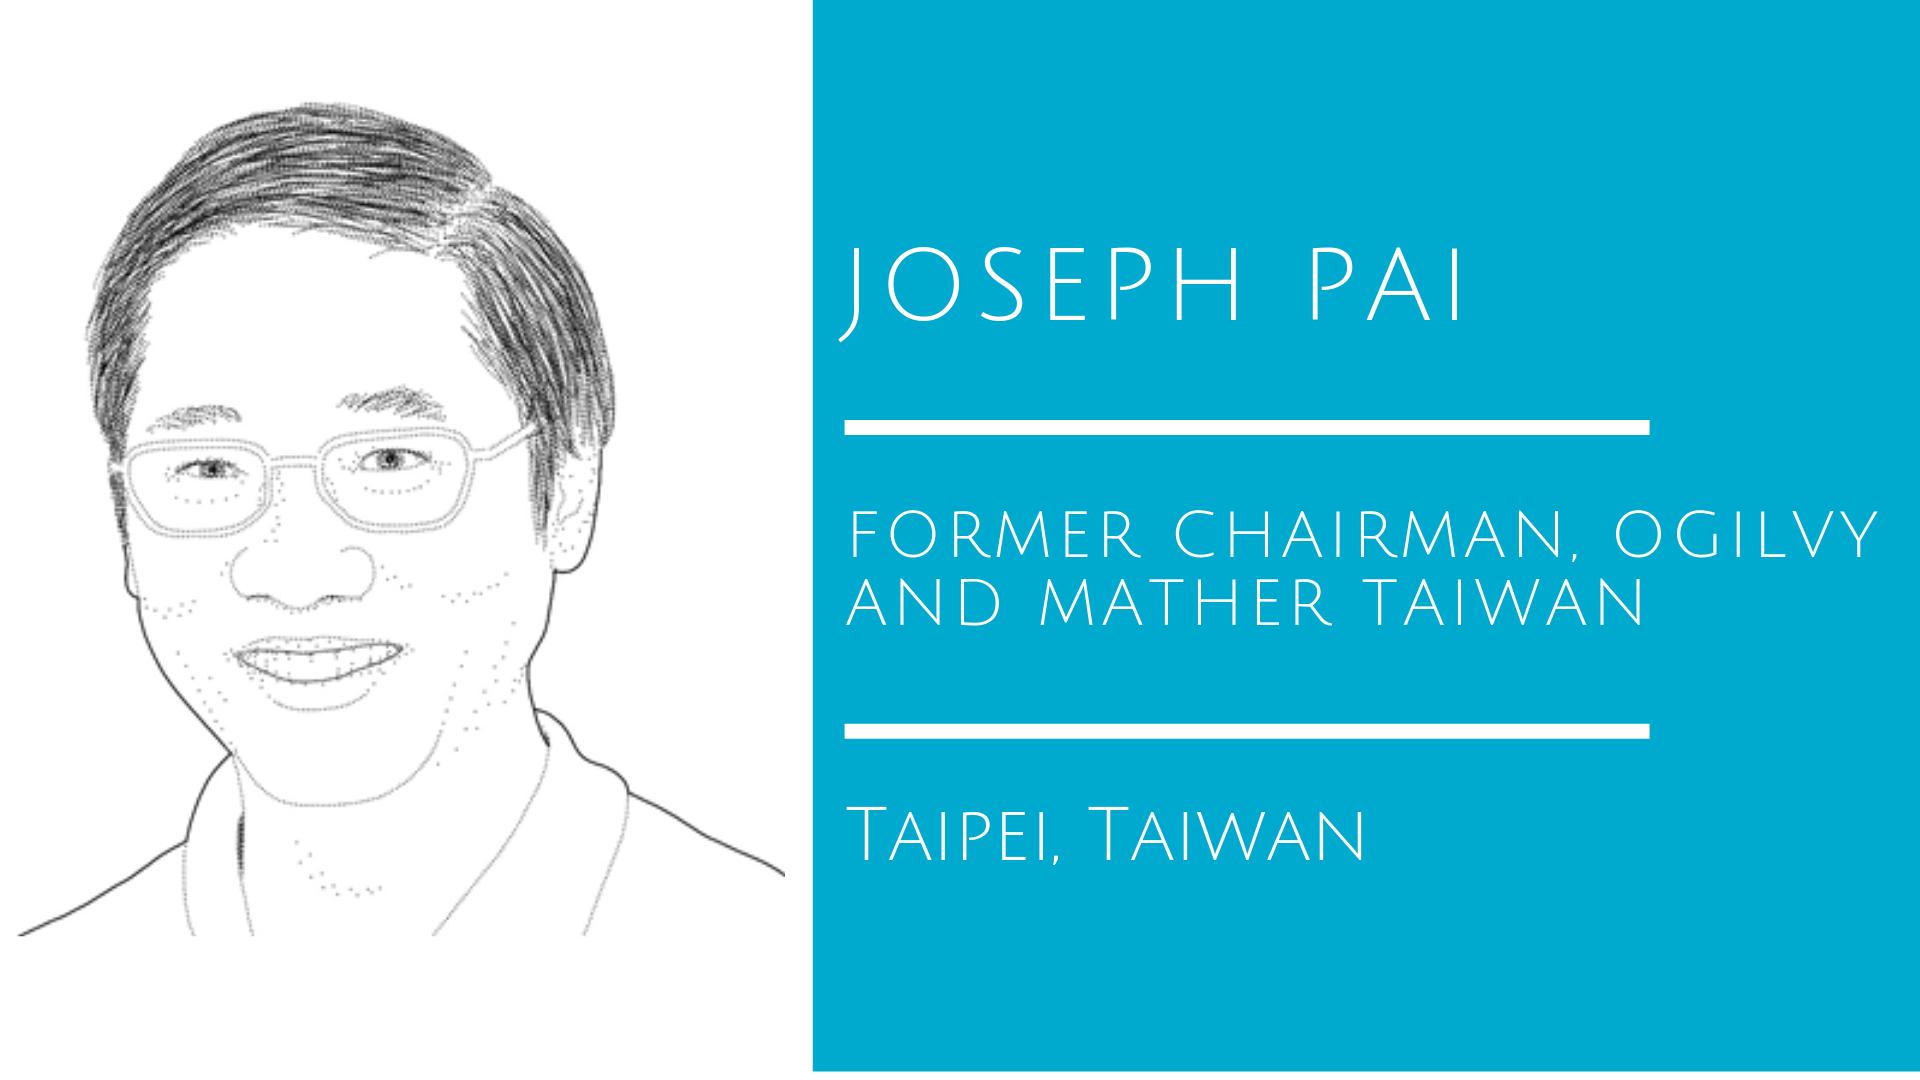 Joseph Pai 2.png